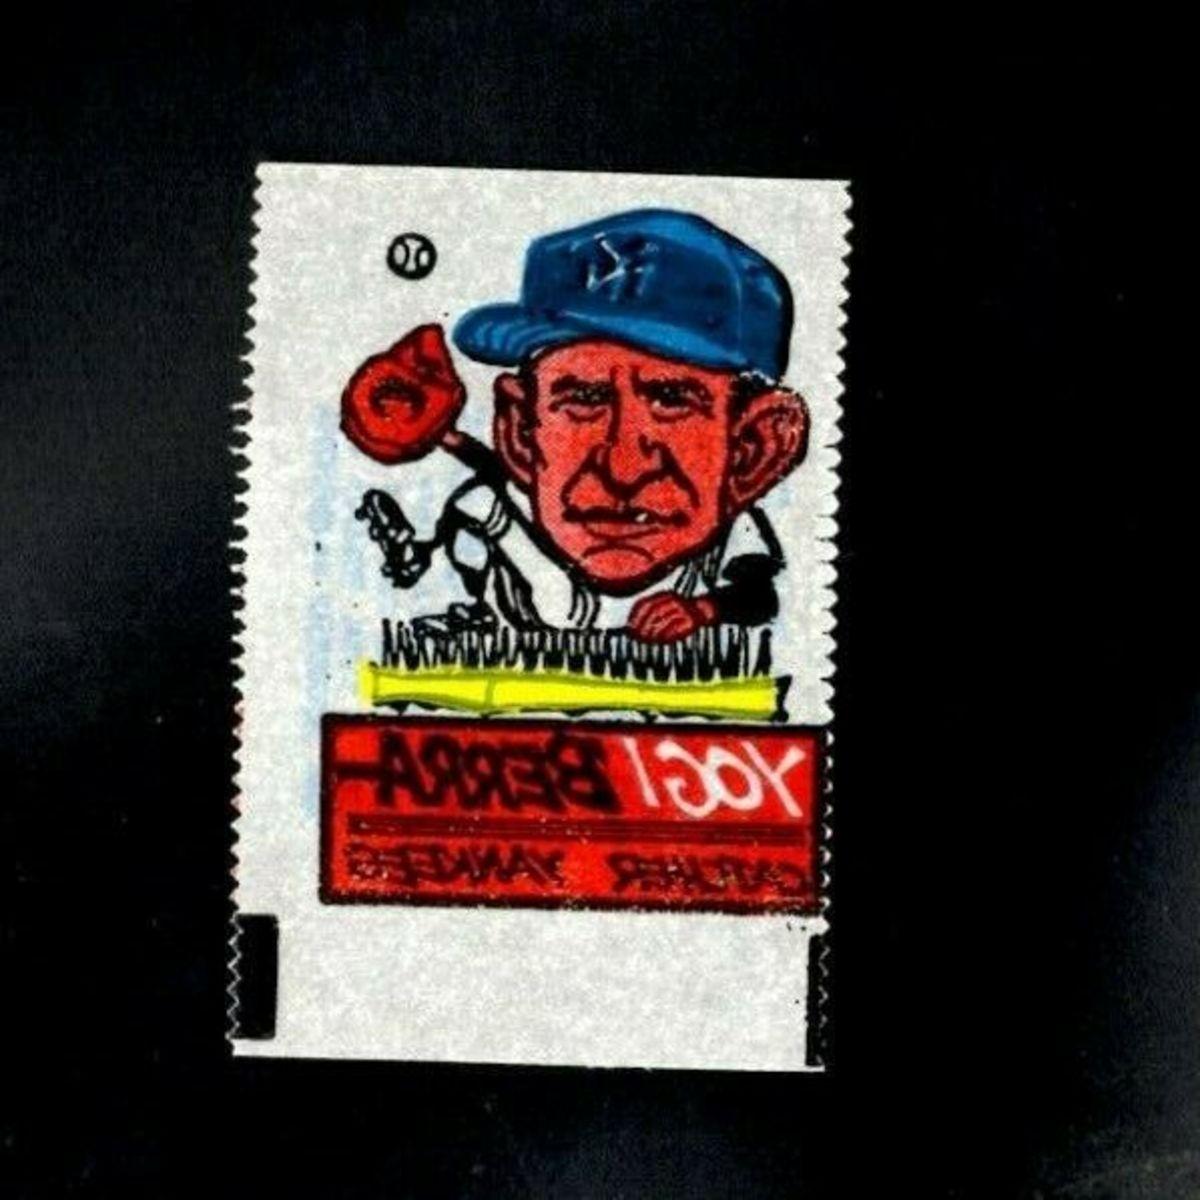 1961 Yogi Berra. Photo: eBay